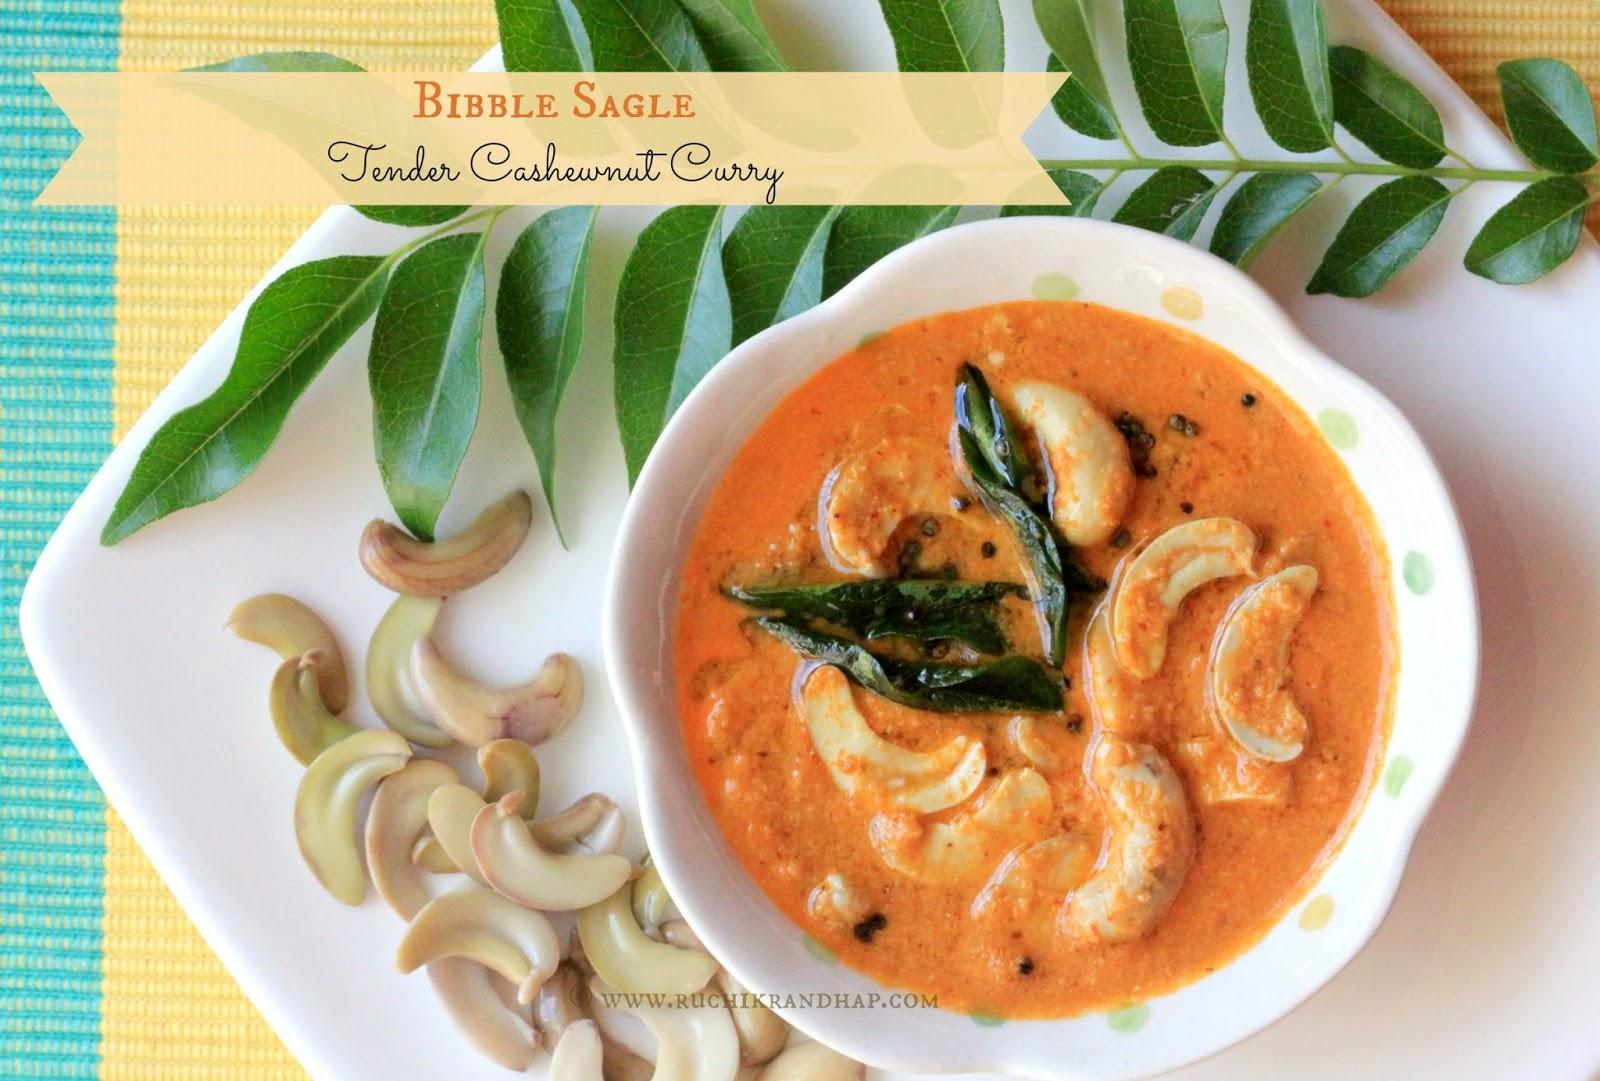 ... Bibbe Sagle (Konkani Style Tender Cashew Nut Curry) ~ Summer Recipe